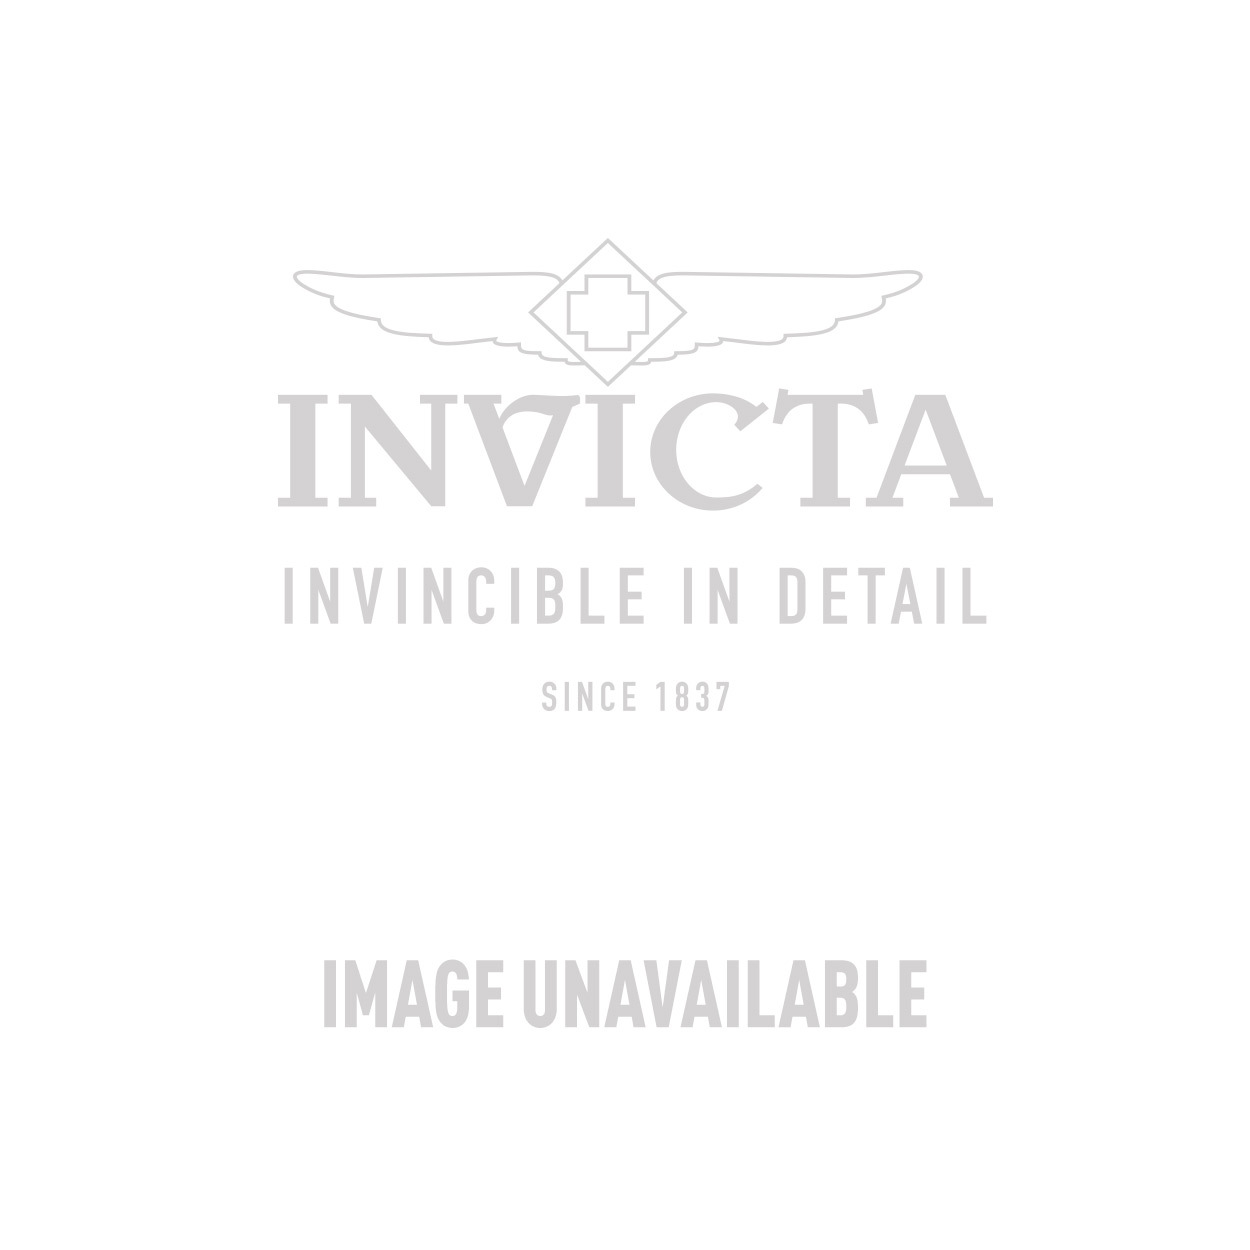 Invicta Lupah Quartz Watch - Gold case with Black tone Polyurethane band - Model 19504